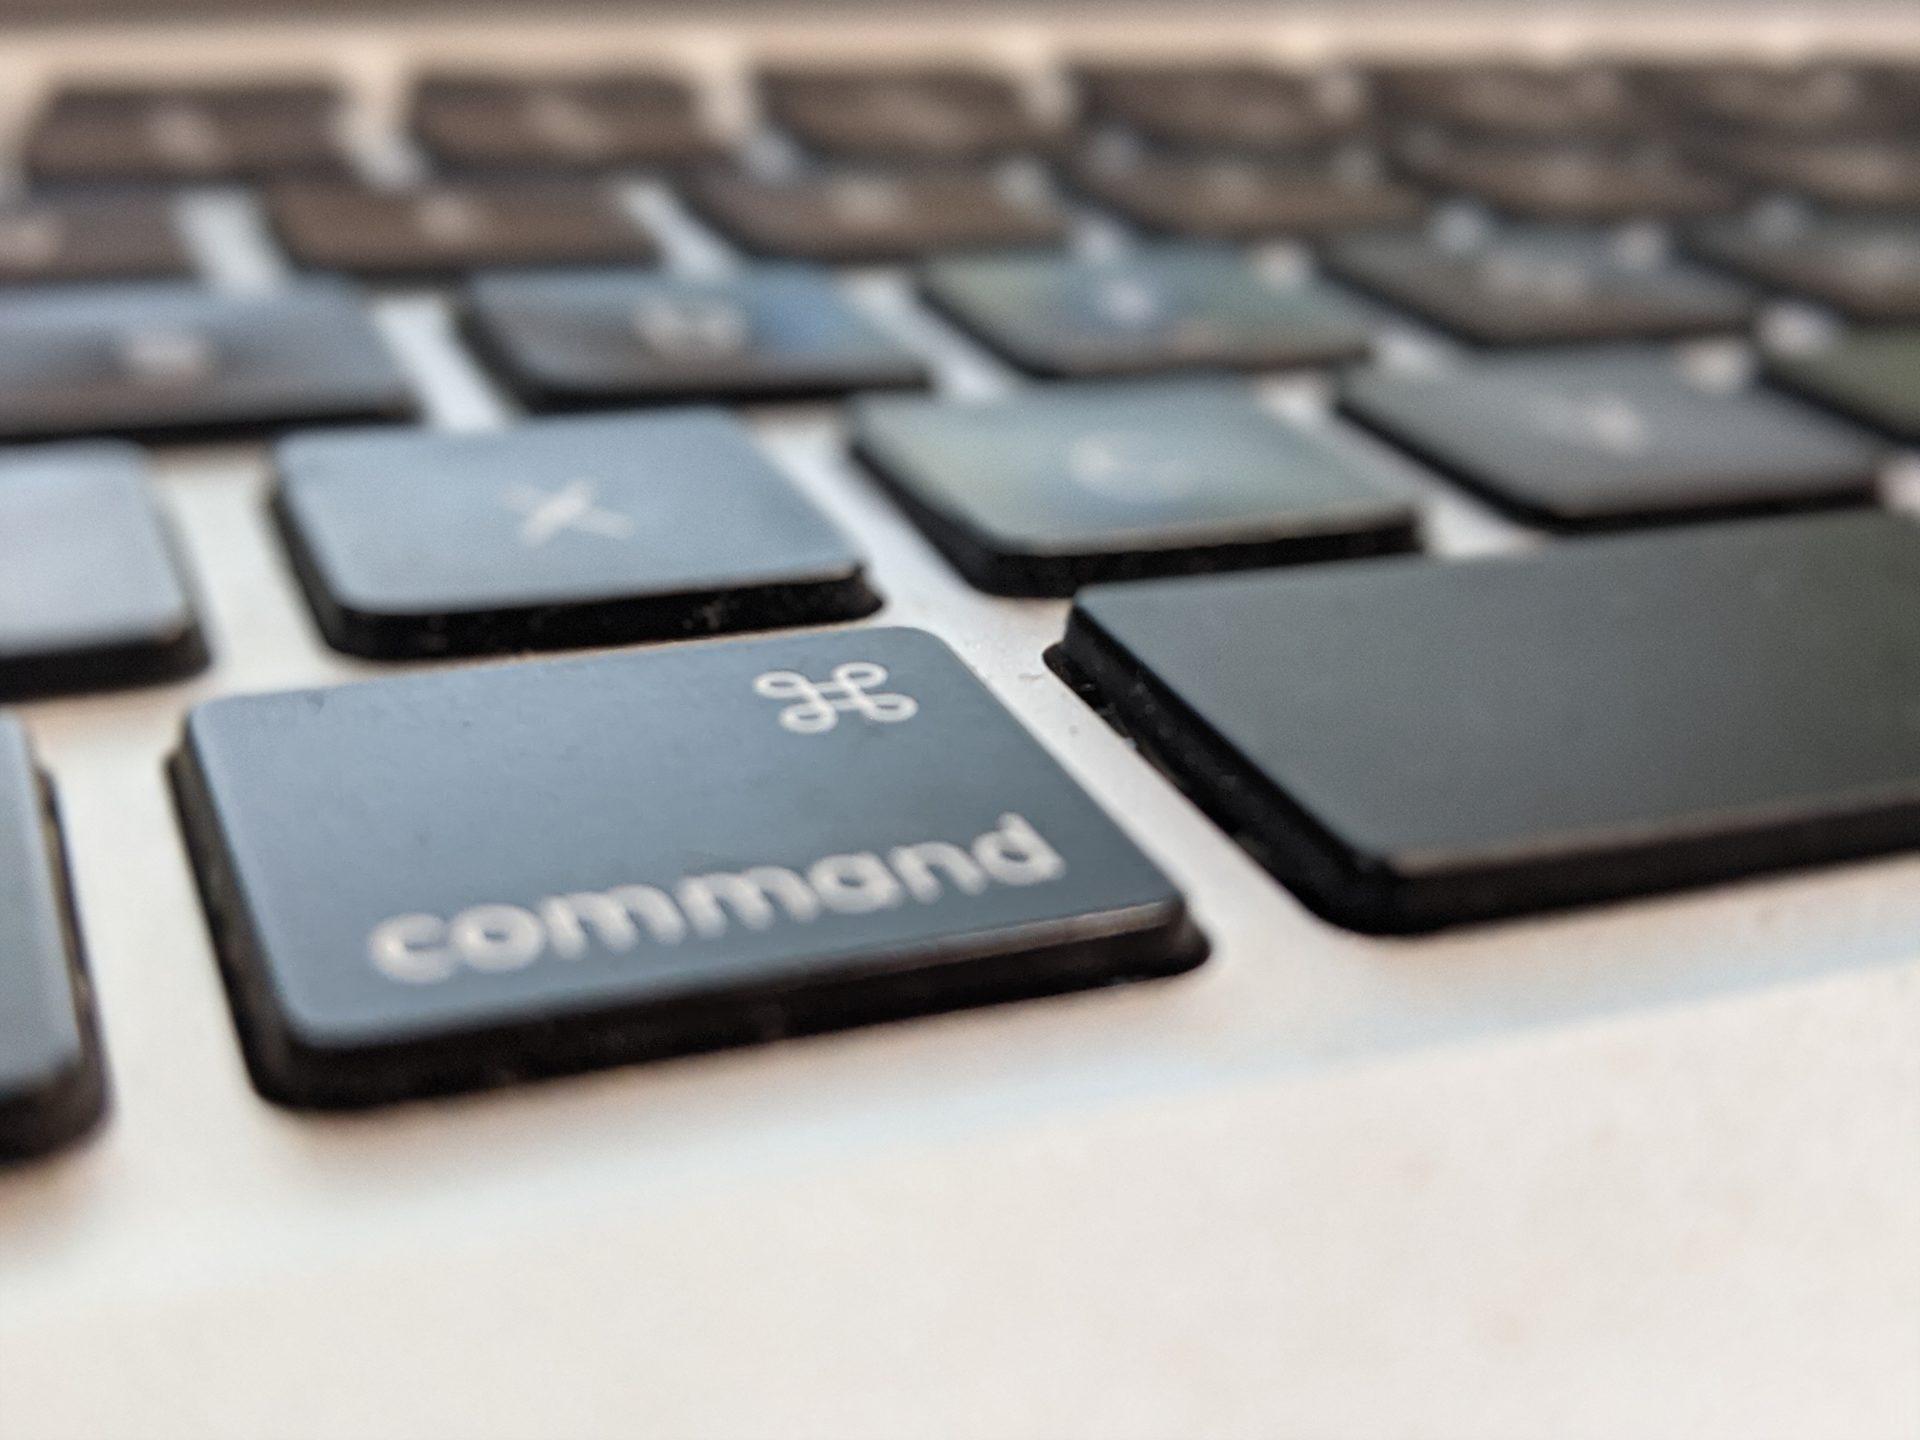 Creating content on Macbook